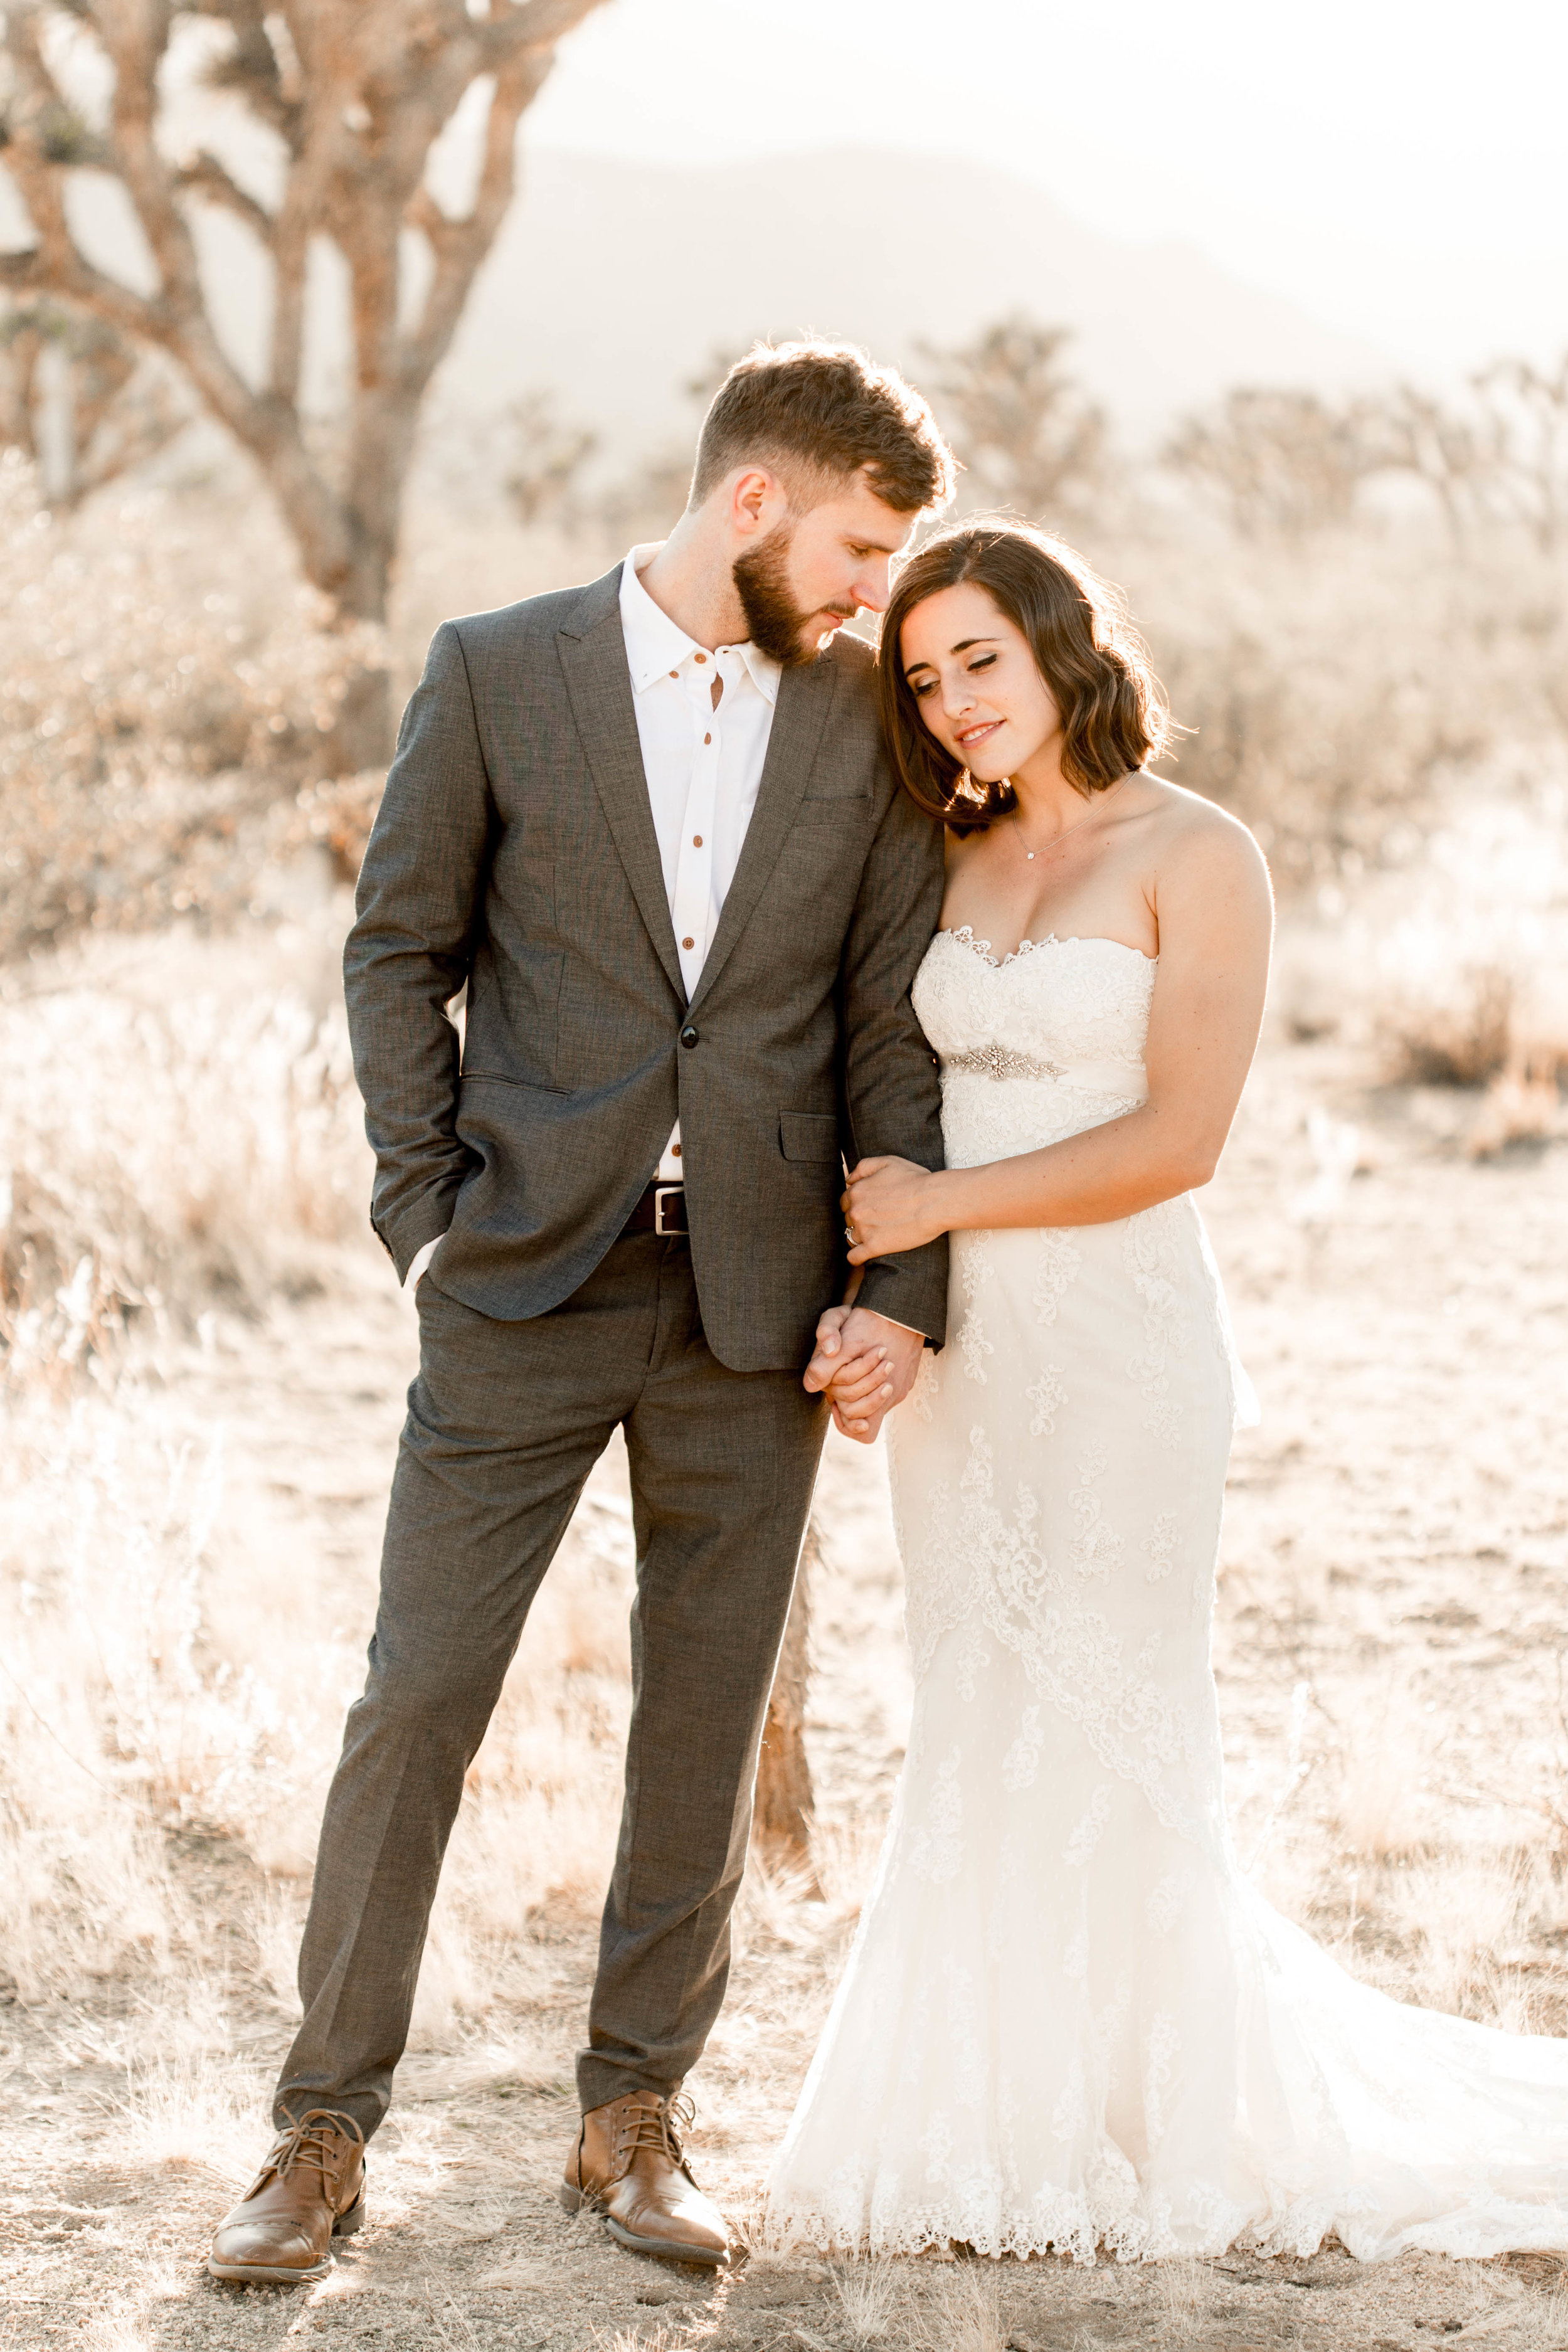 nicole-daacke-photography-joshua-tree-adventurous-elopement-wedding-national-park-wedding-photographer-adventure-wedding-adventurous-elopement-jtree-joshua-tree-national-park-wedding-photographer-intimate-weddings-golden-desert-love-9.jpg